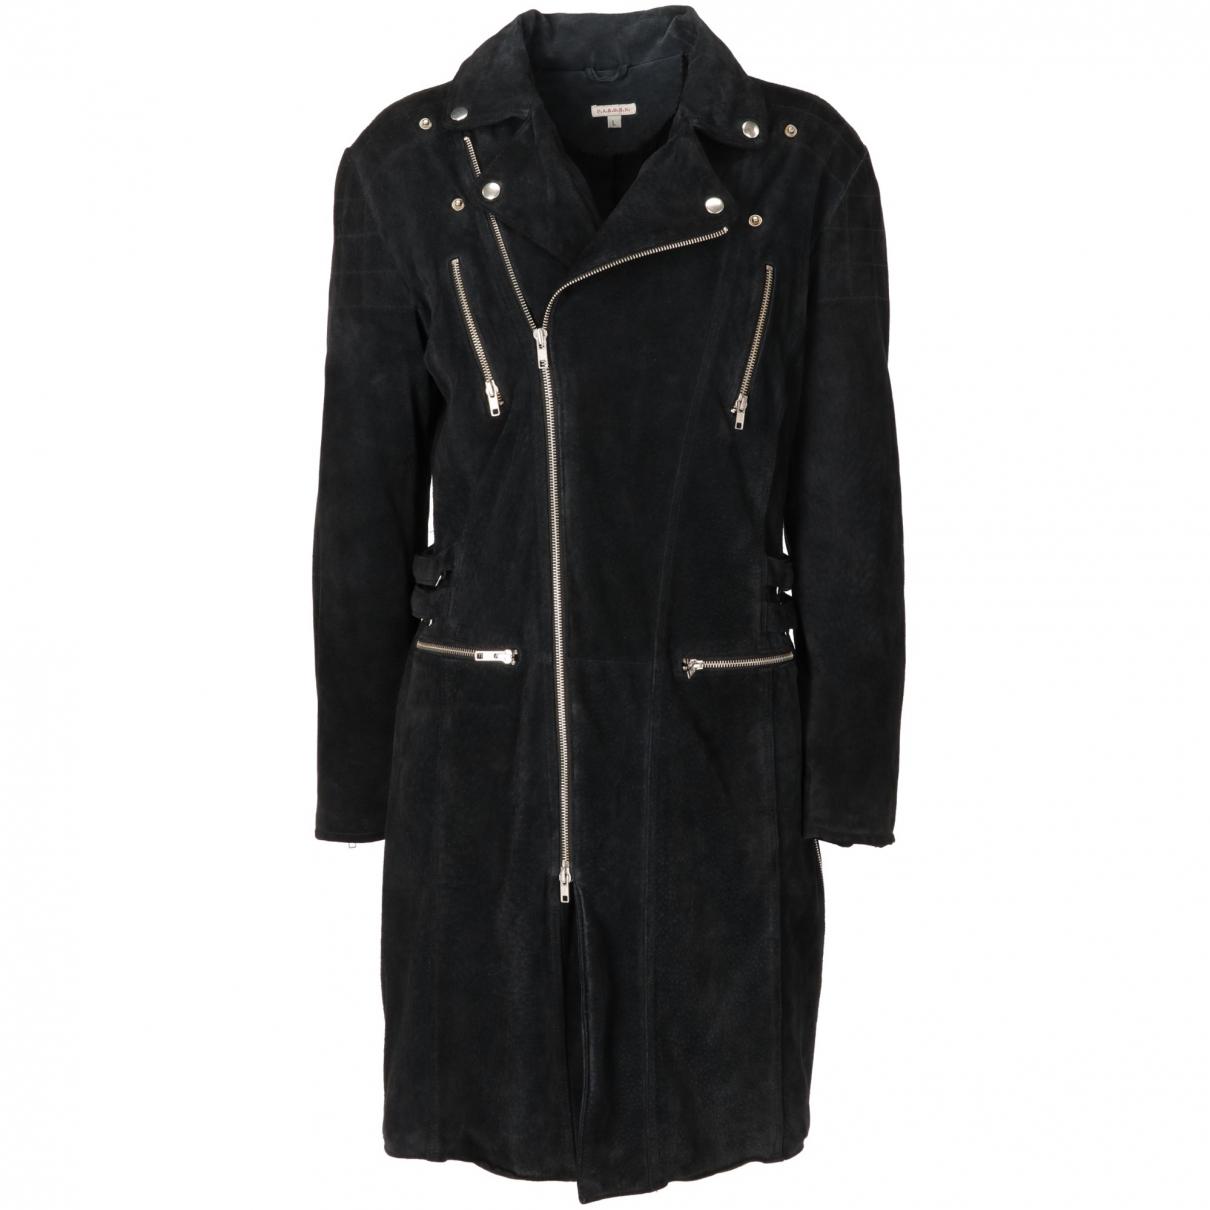 Parosh \N Black Suede coat for Women L International